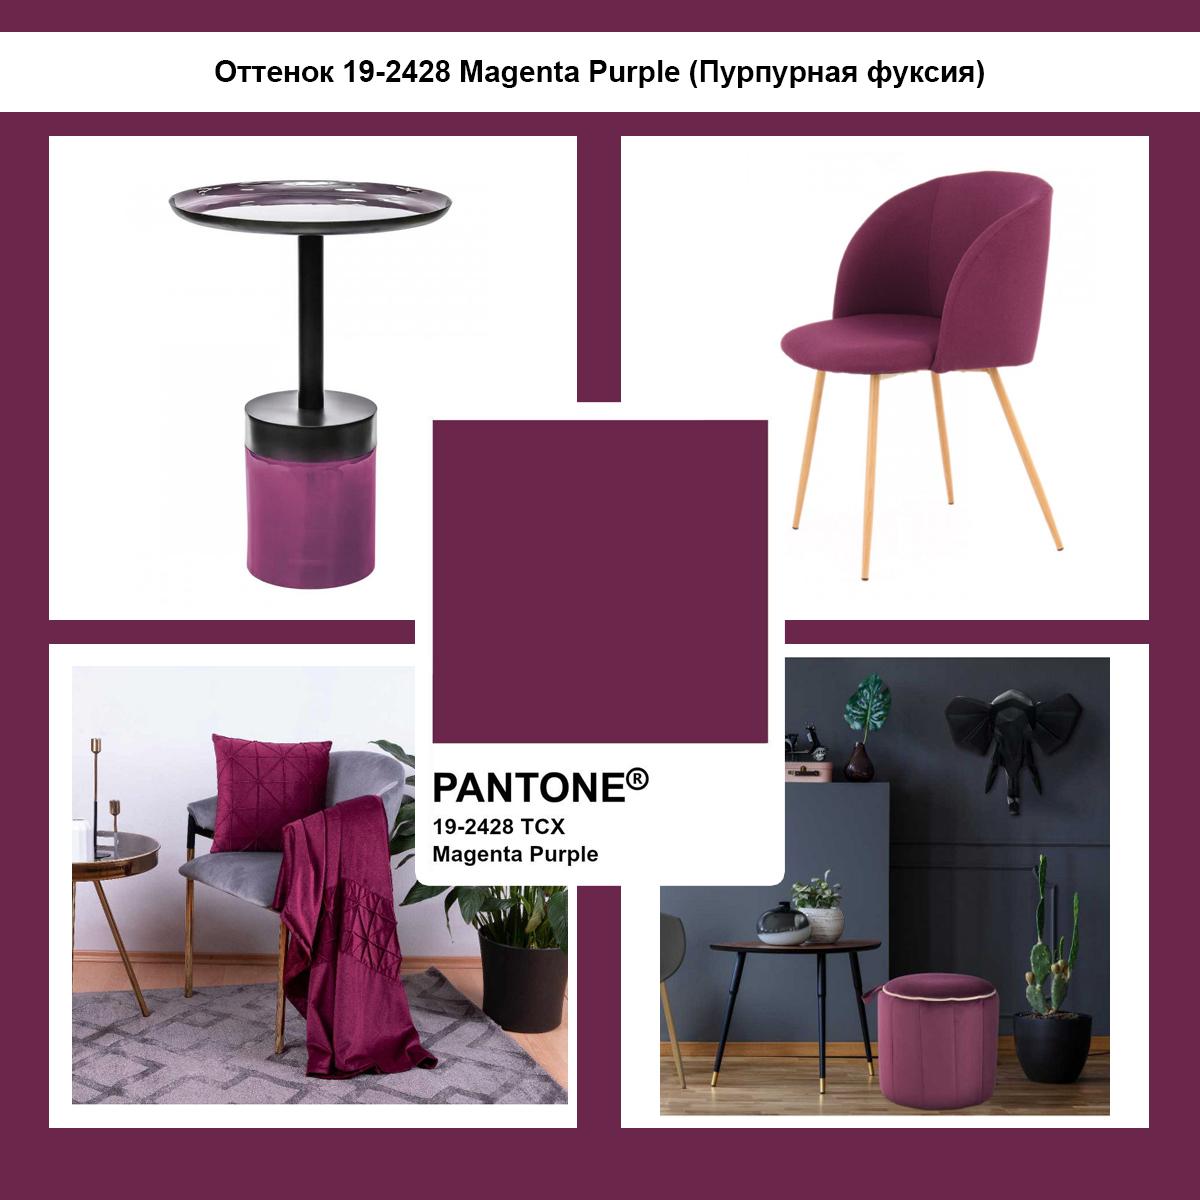 19-2428 Magenta Purple